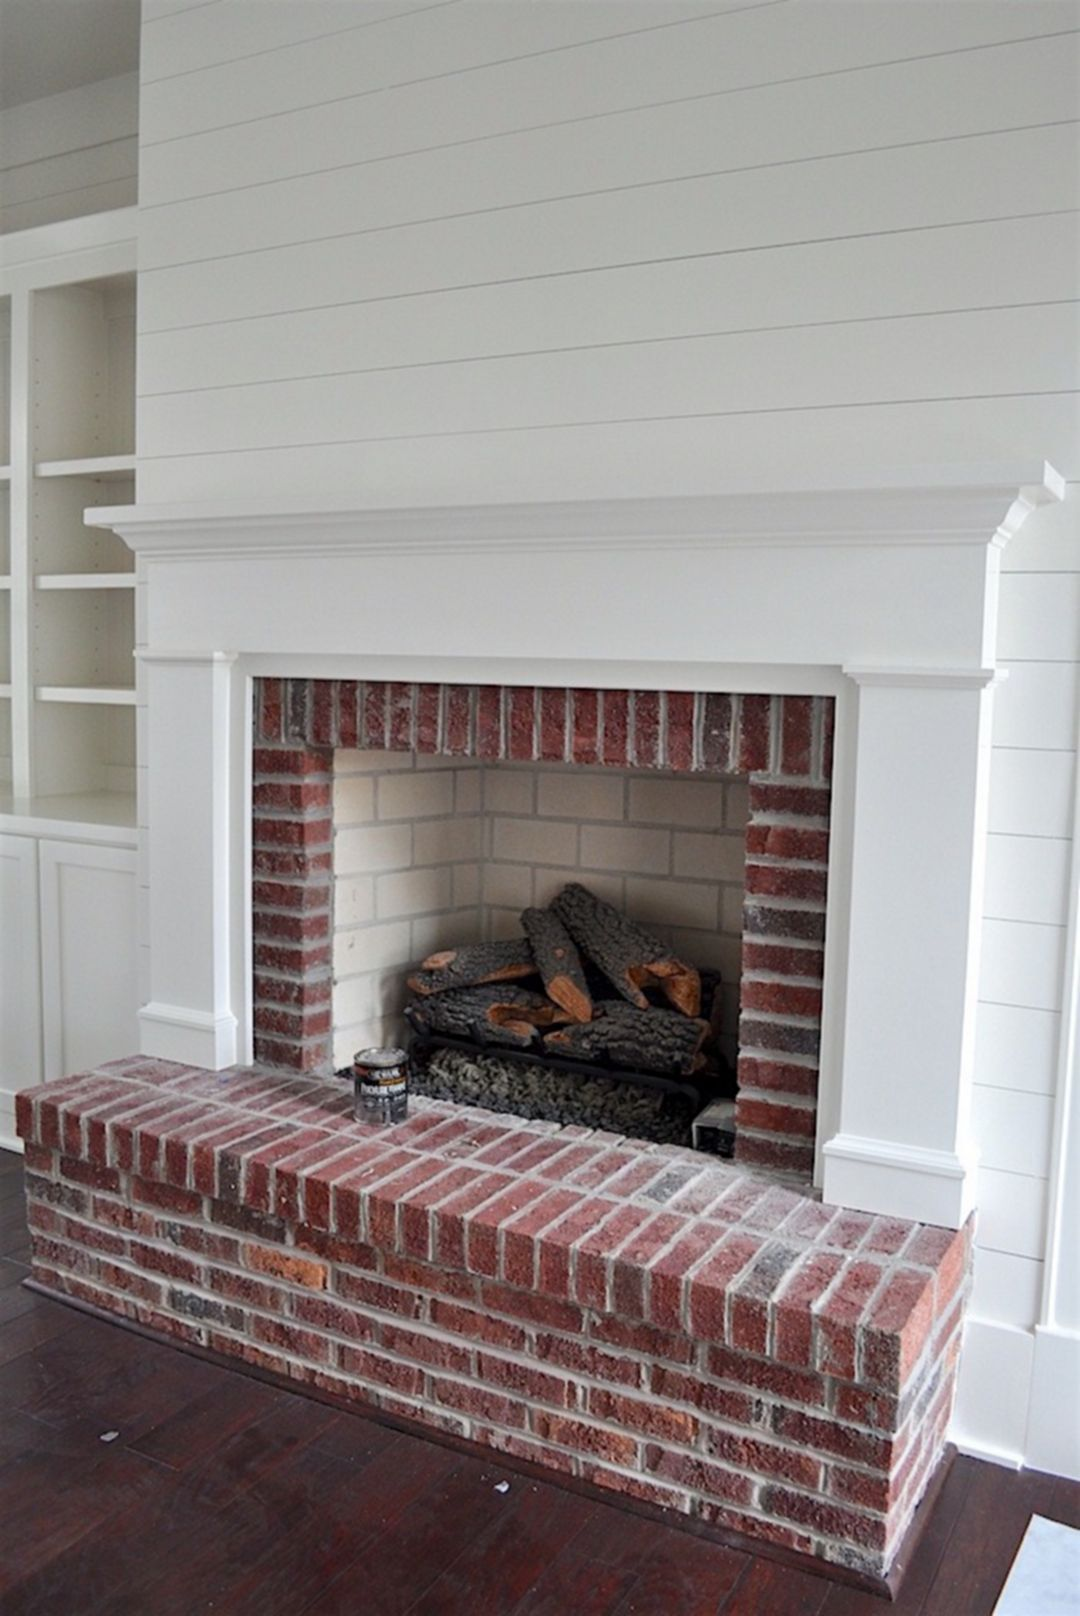 Brick Fireplace Mantle 91 Brick fireplace mantles, Brick